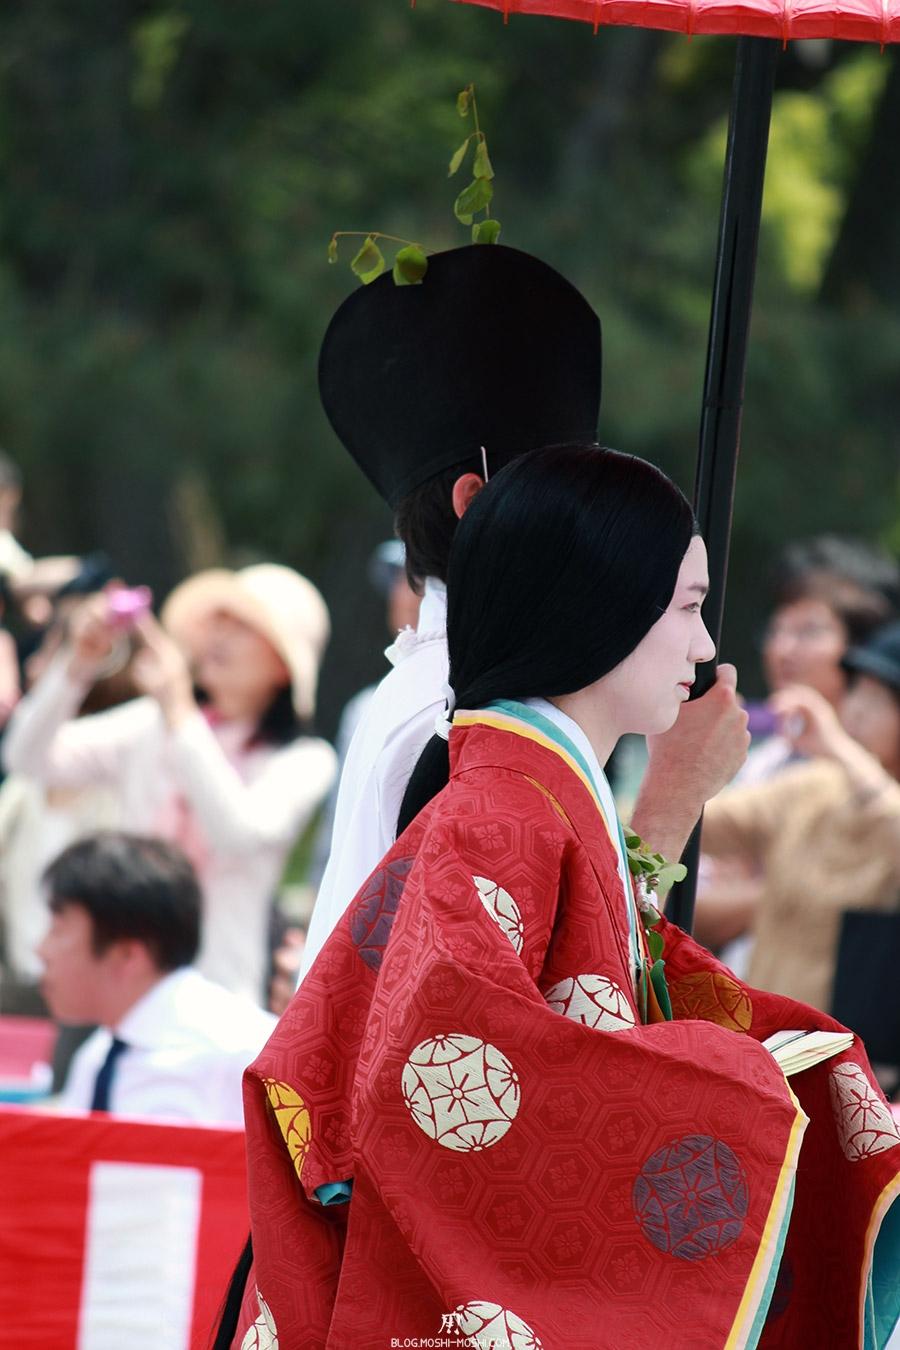 kyoto-aoi-matsuri-palais-imperial-defile-femme-nyoju-superbe-kimono-rouge